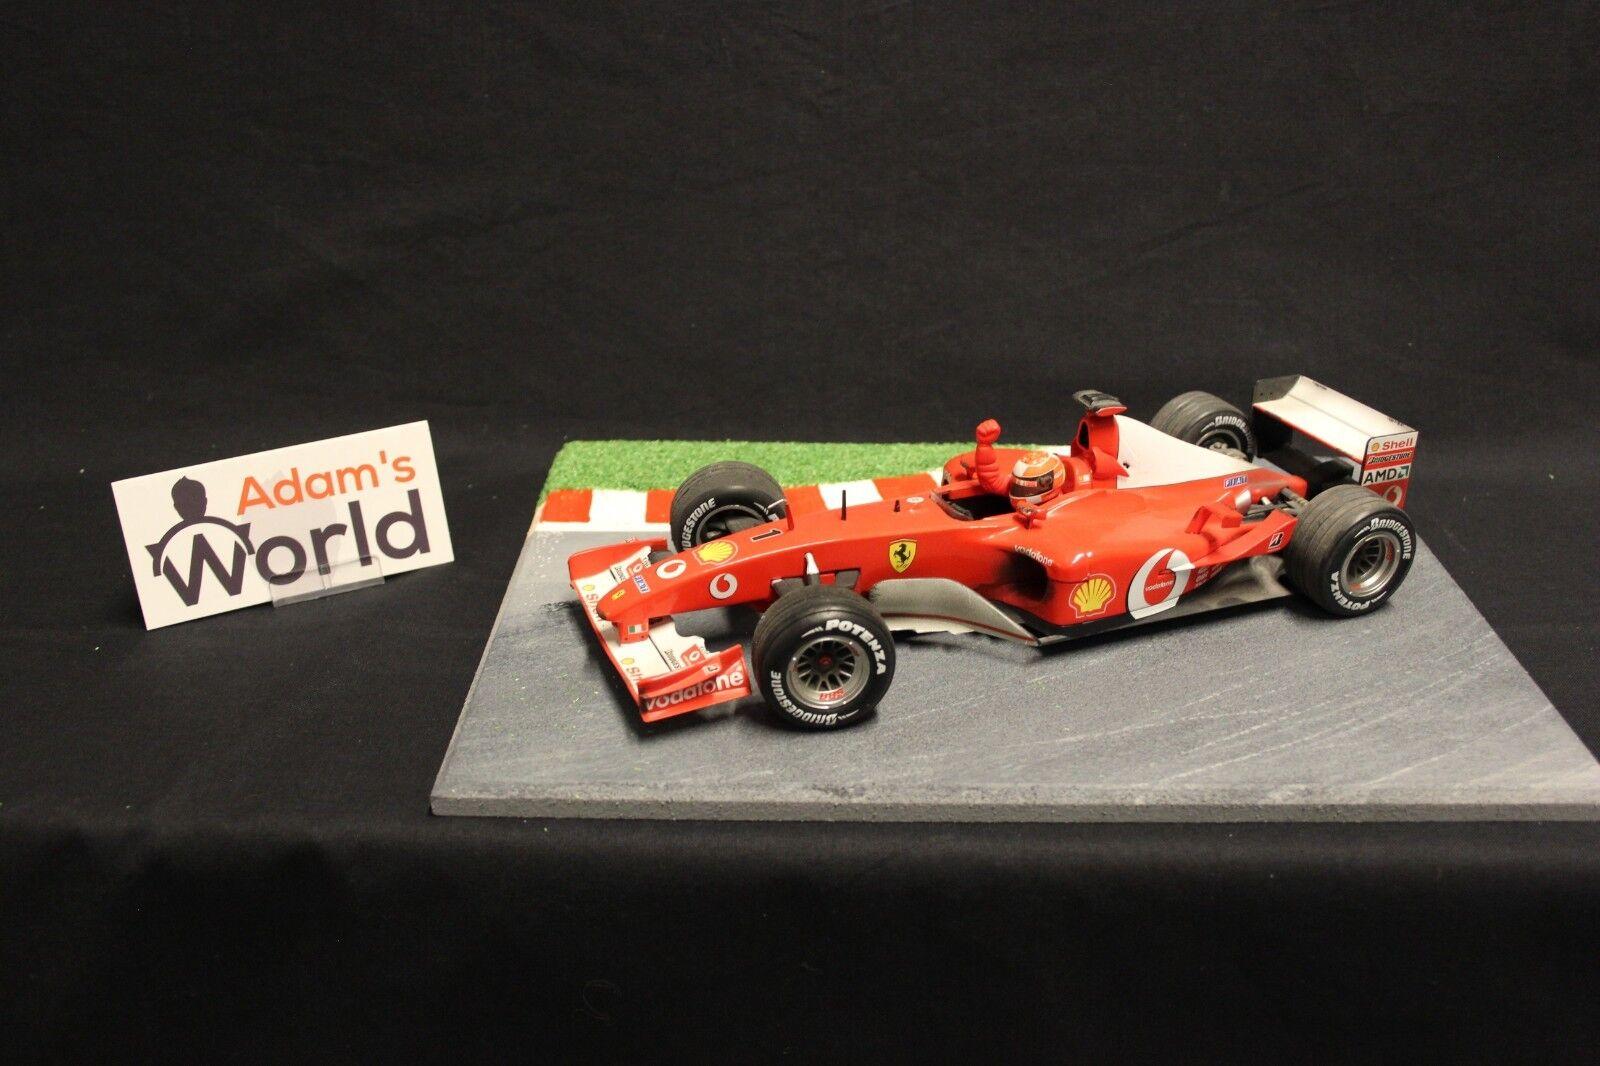 Hot Wheels Ferrari F2002 2002 1 18 Michael Schumacher (GER) (F1NB) WC